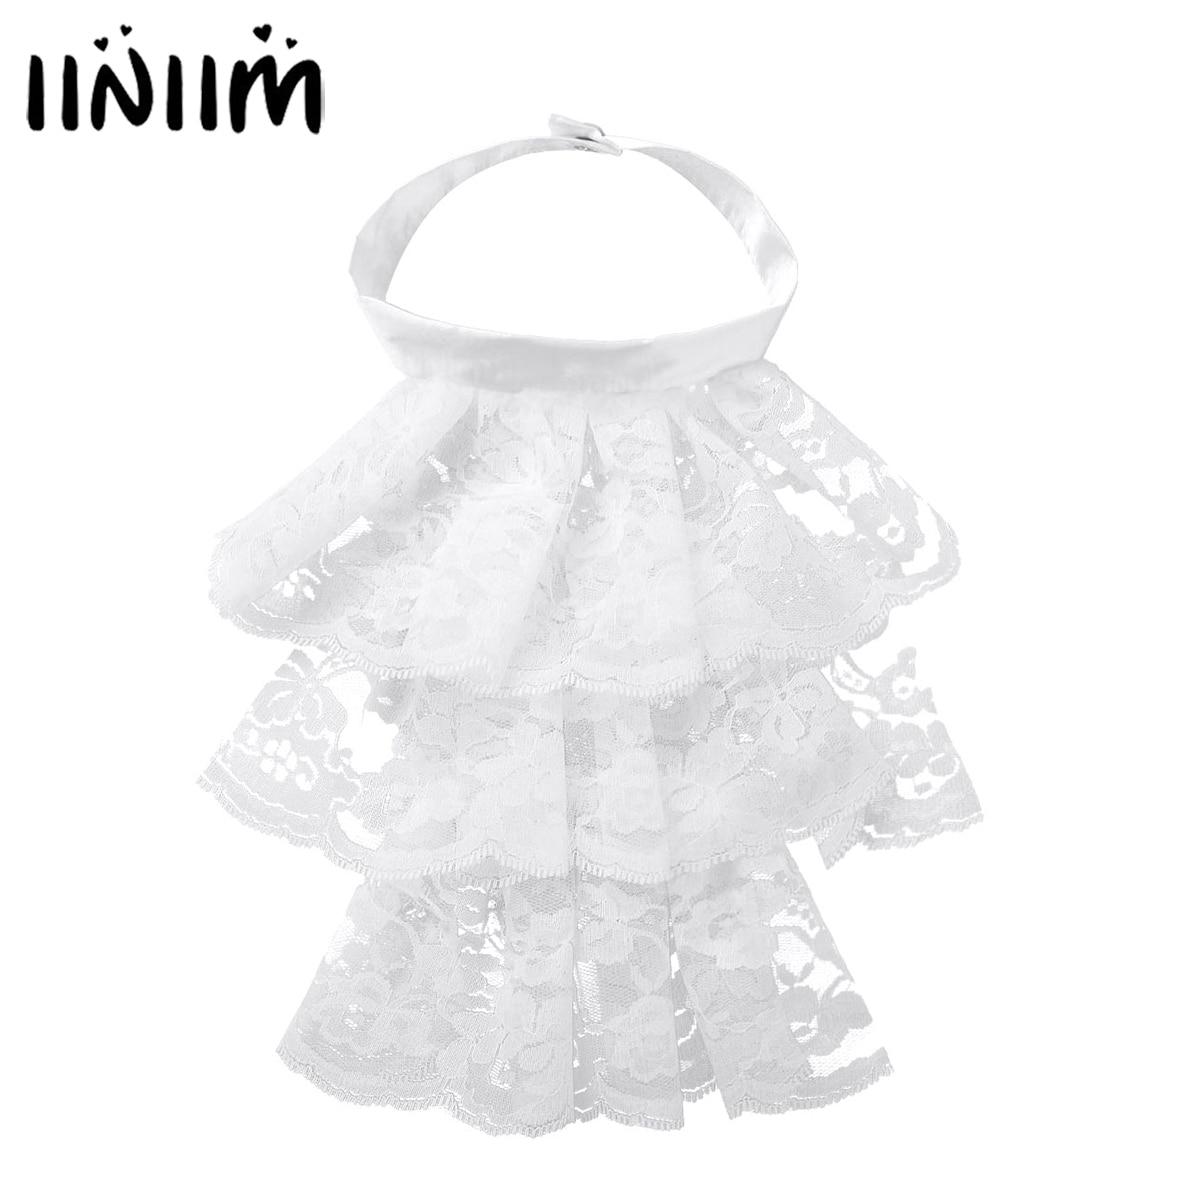 Iiniim Womens Femme Victorian Renaissance Detachable Ruffled Lace Jabot Neck Collar Stage Party Steampunk Costume Accessory